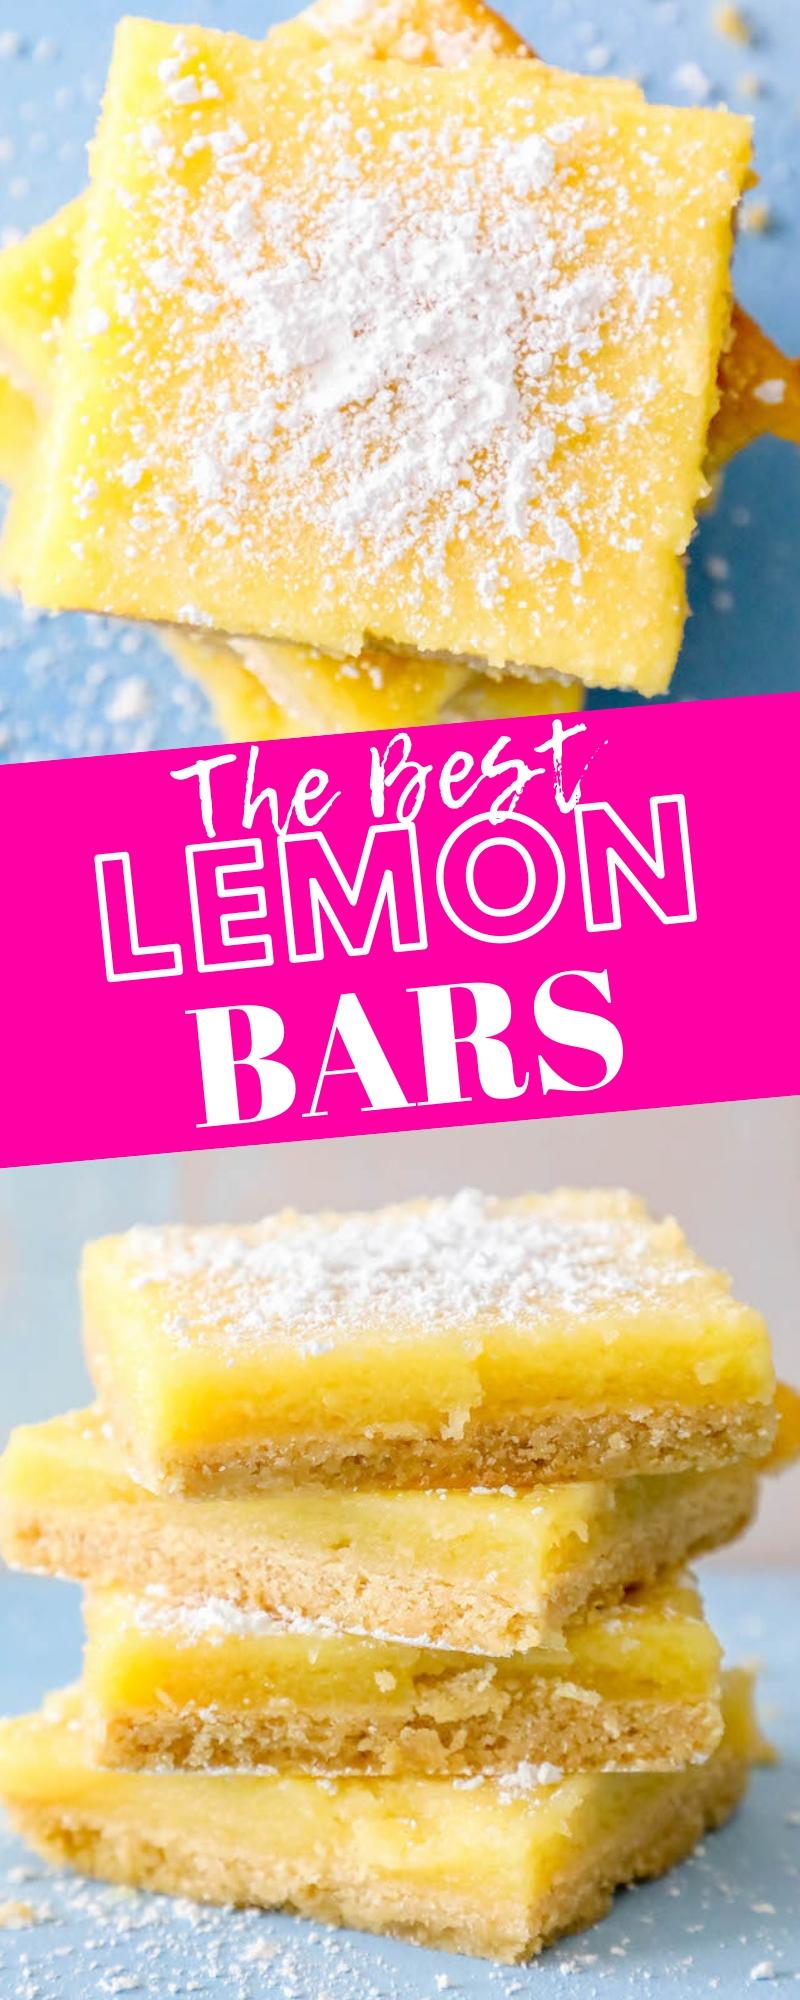 picture of lemon bars